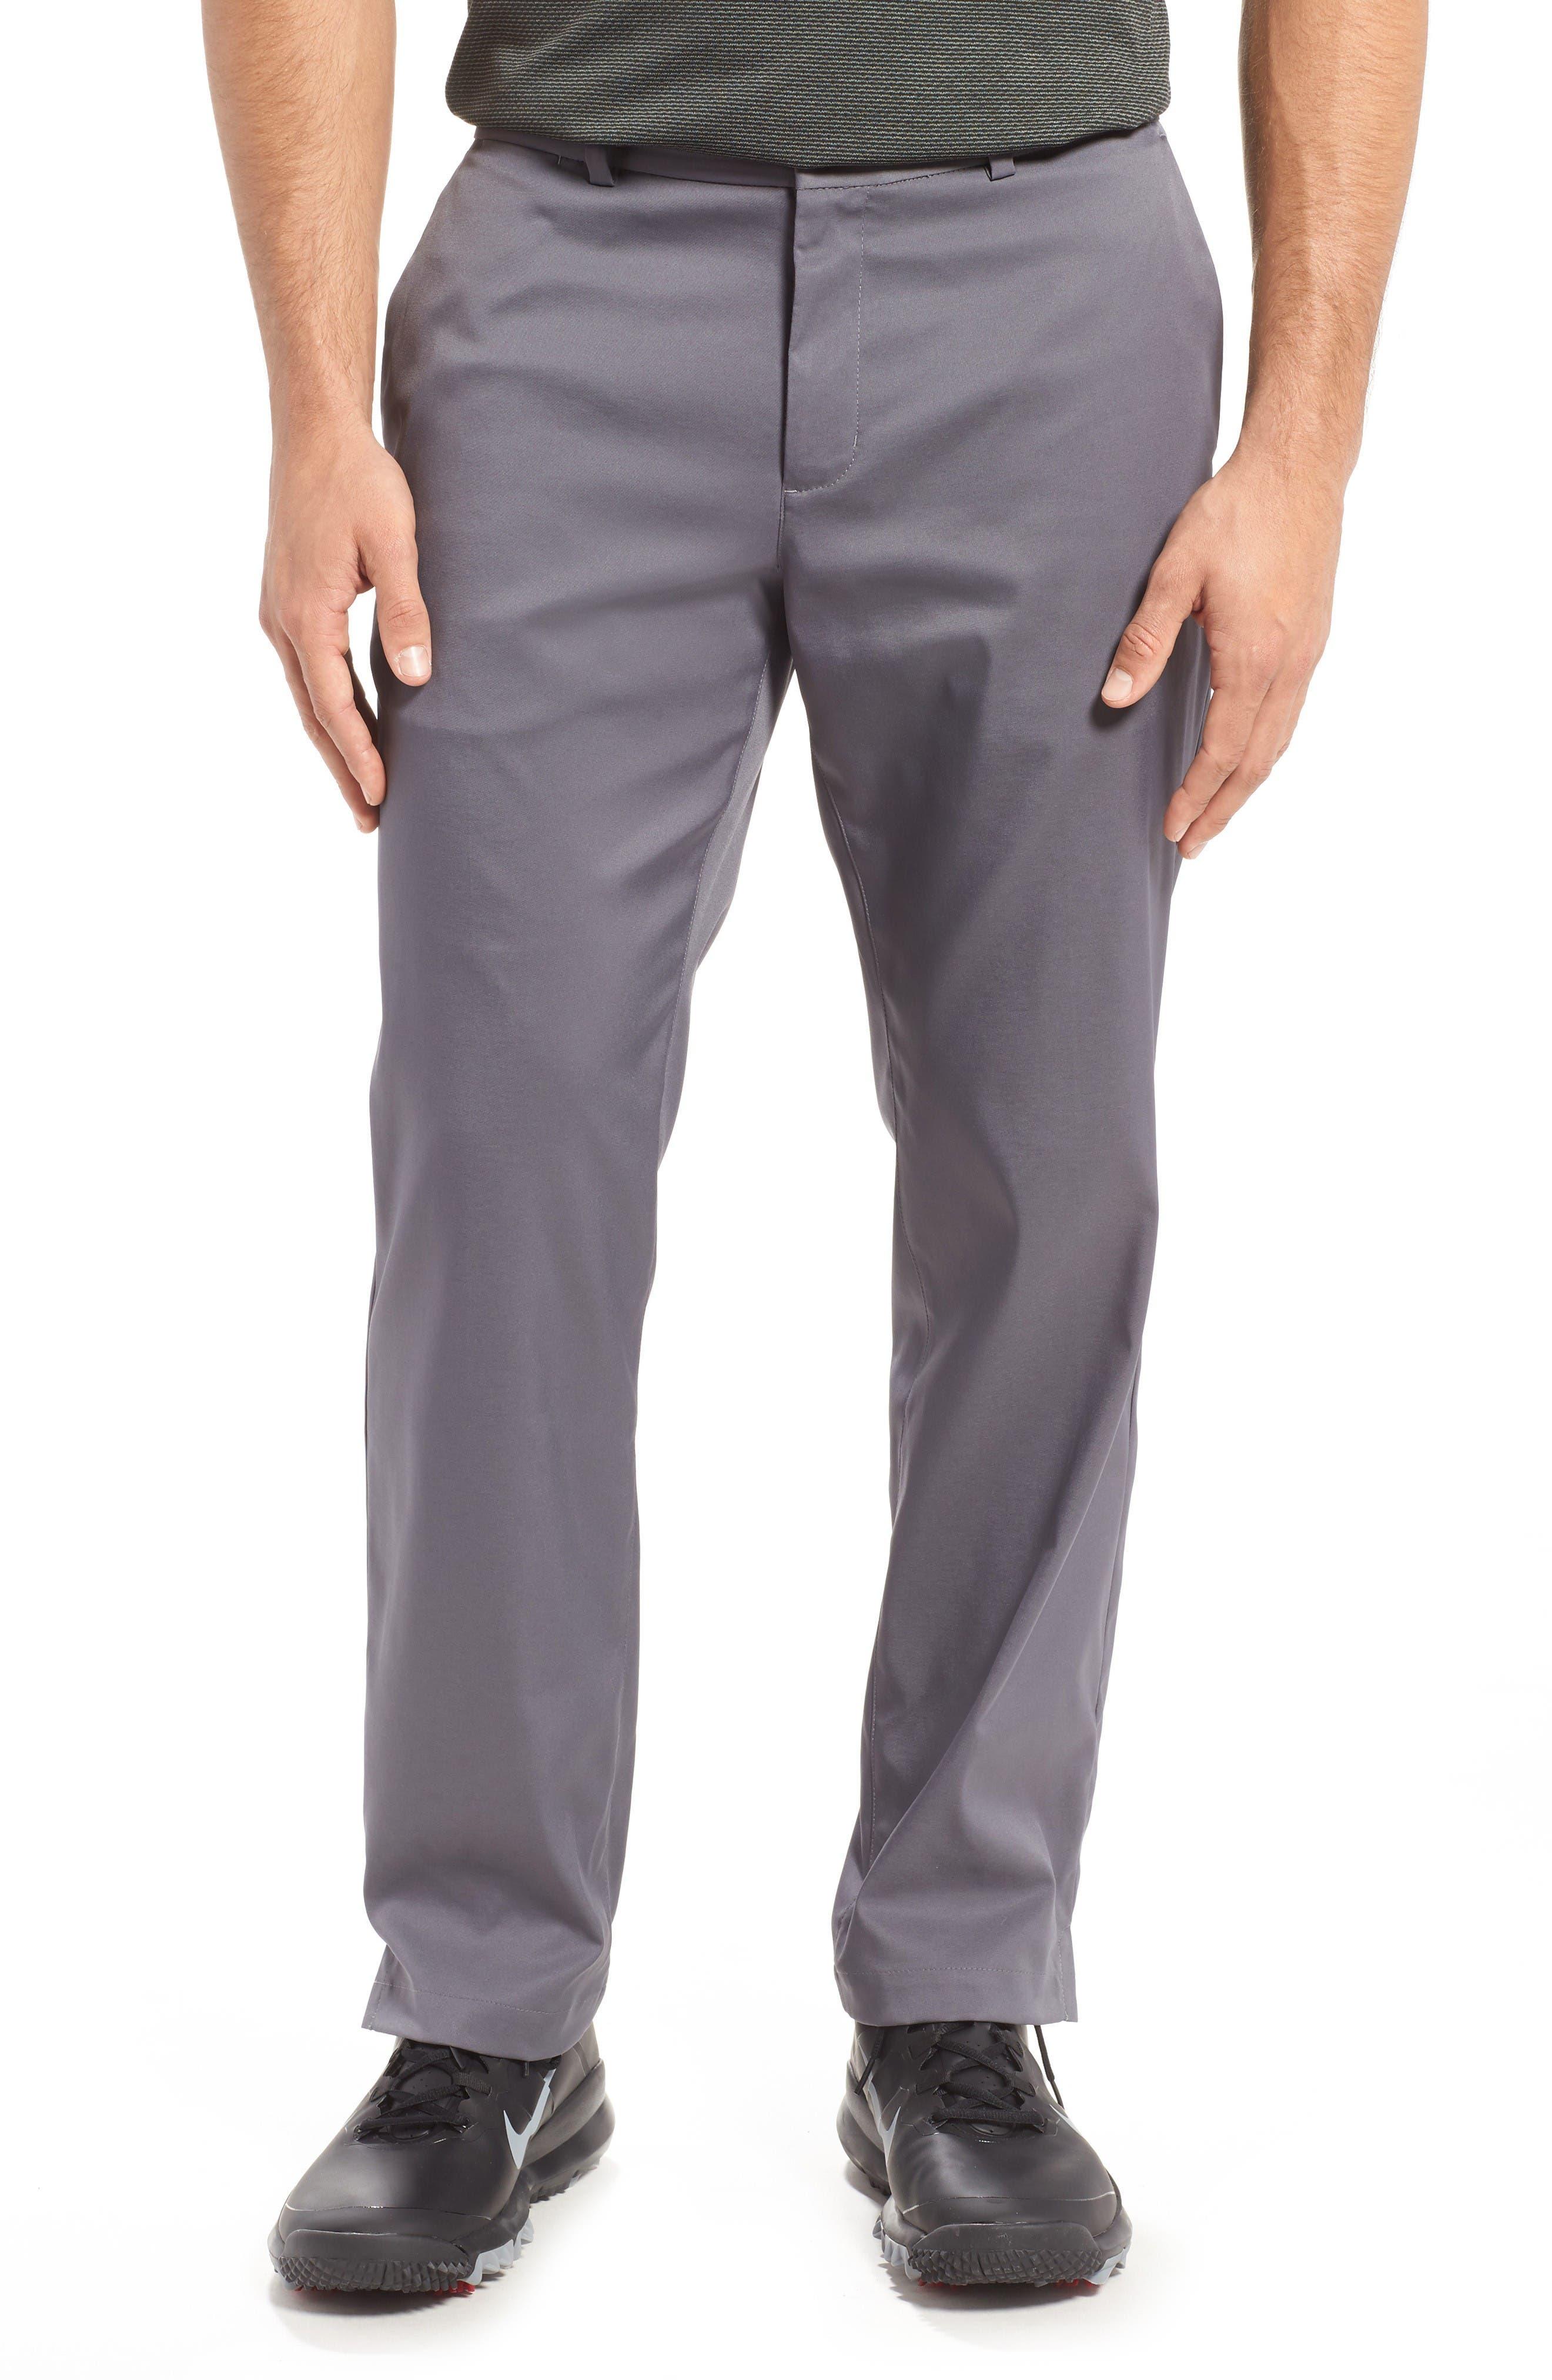 Alternate Image 1 Selected - Nike Flat Front Dri-FIT Tech Golf Pants